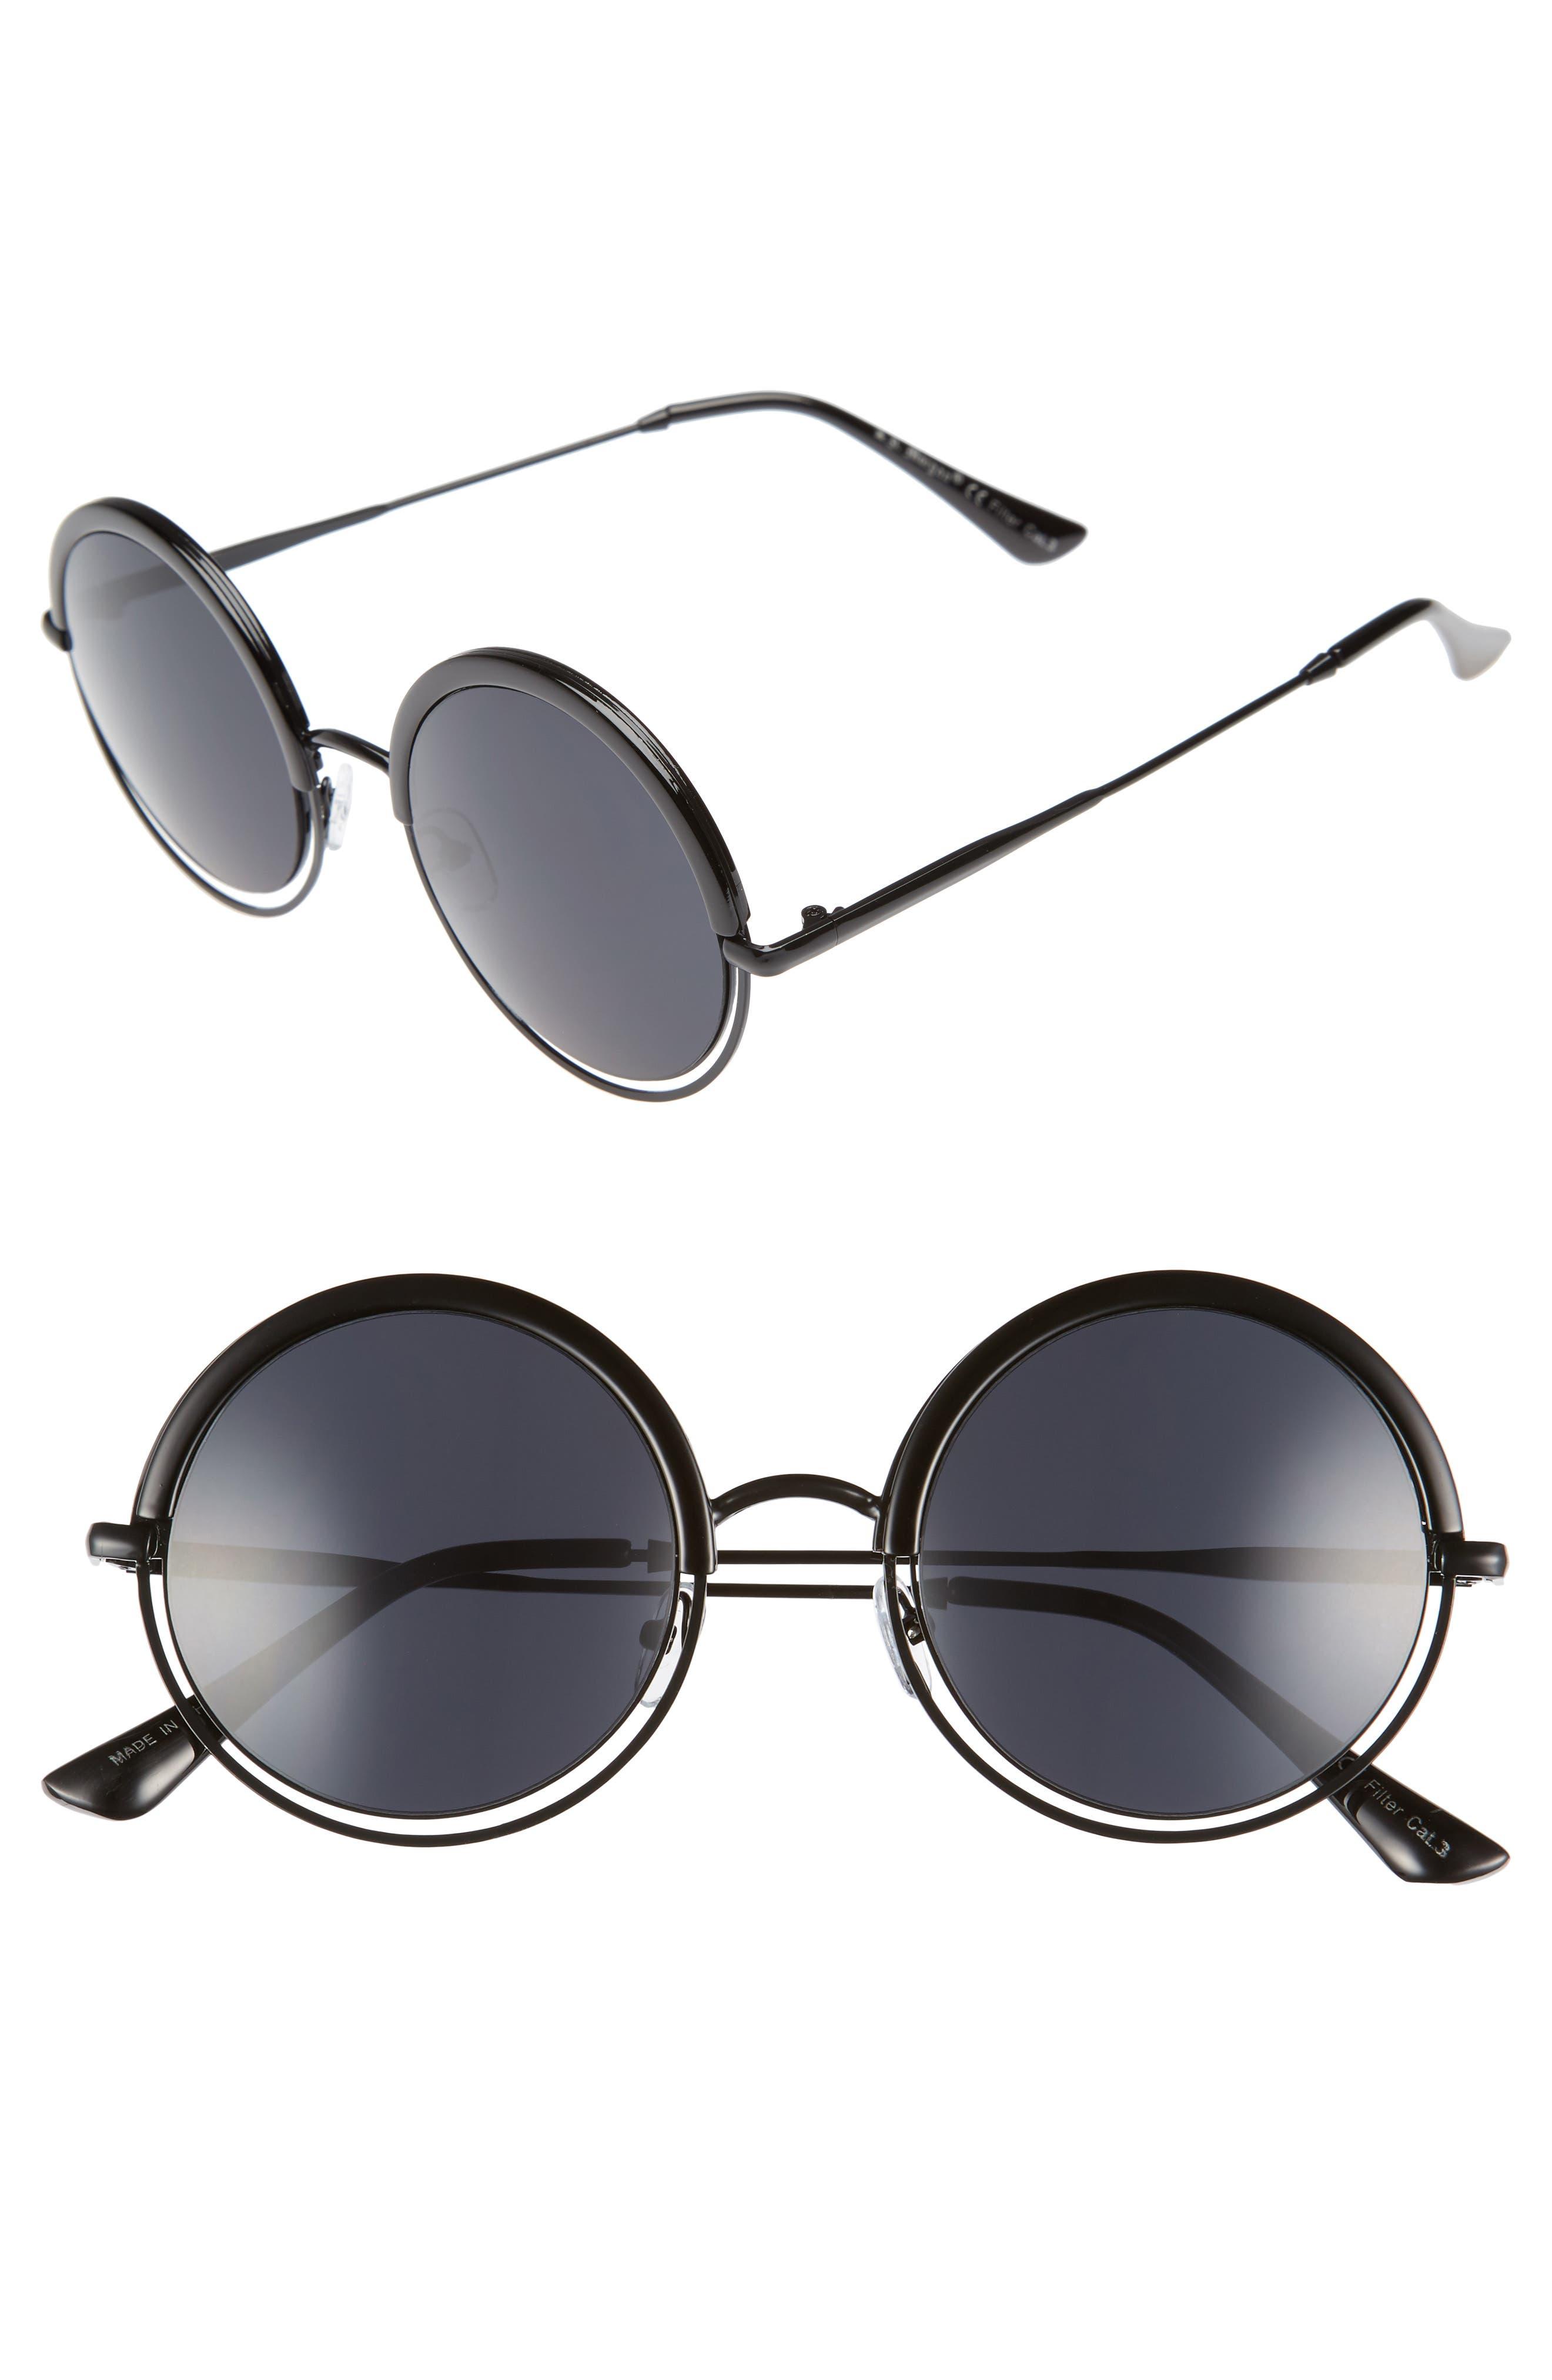 A.J. MORGAN,                             Pancakes 52mm Gradient Lens Round Sunglasses,                             Main thumbnail 1, color,                             001